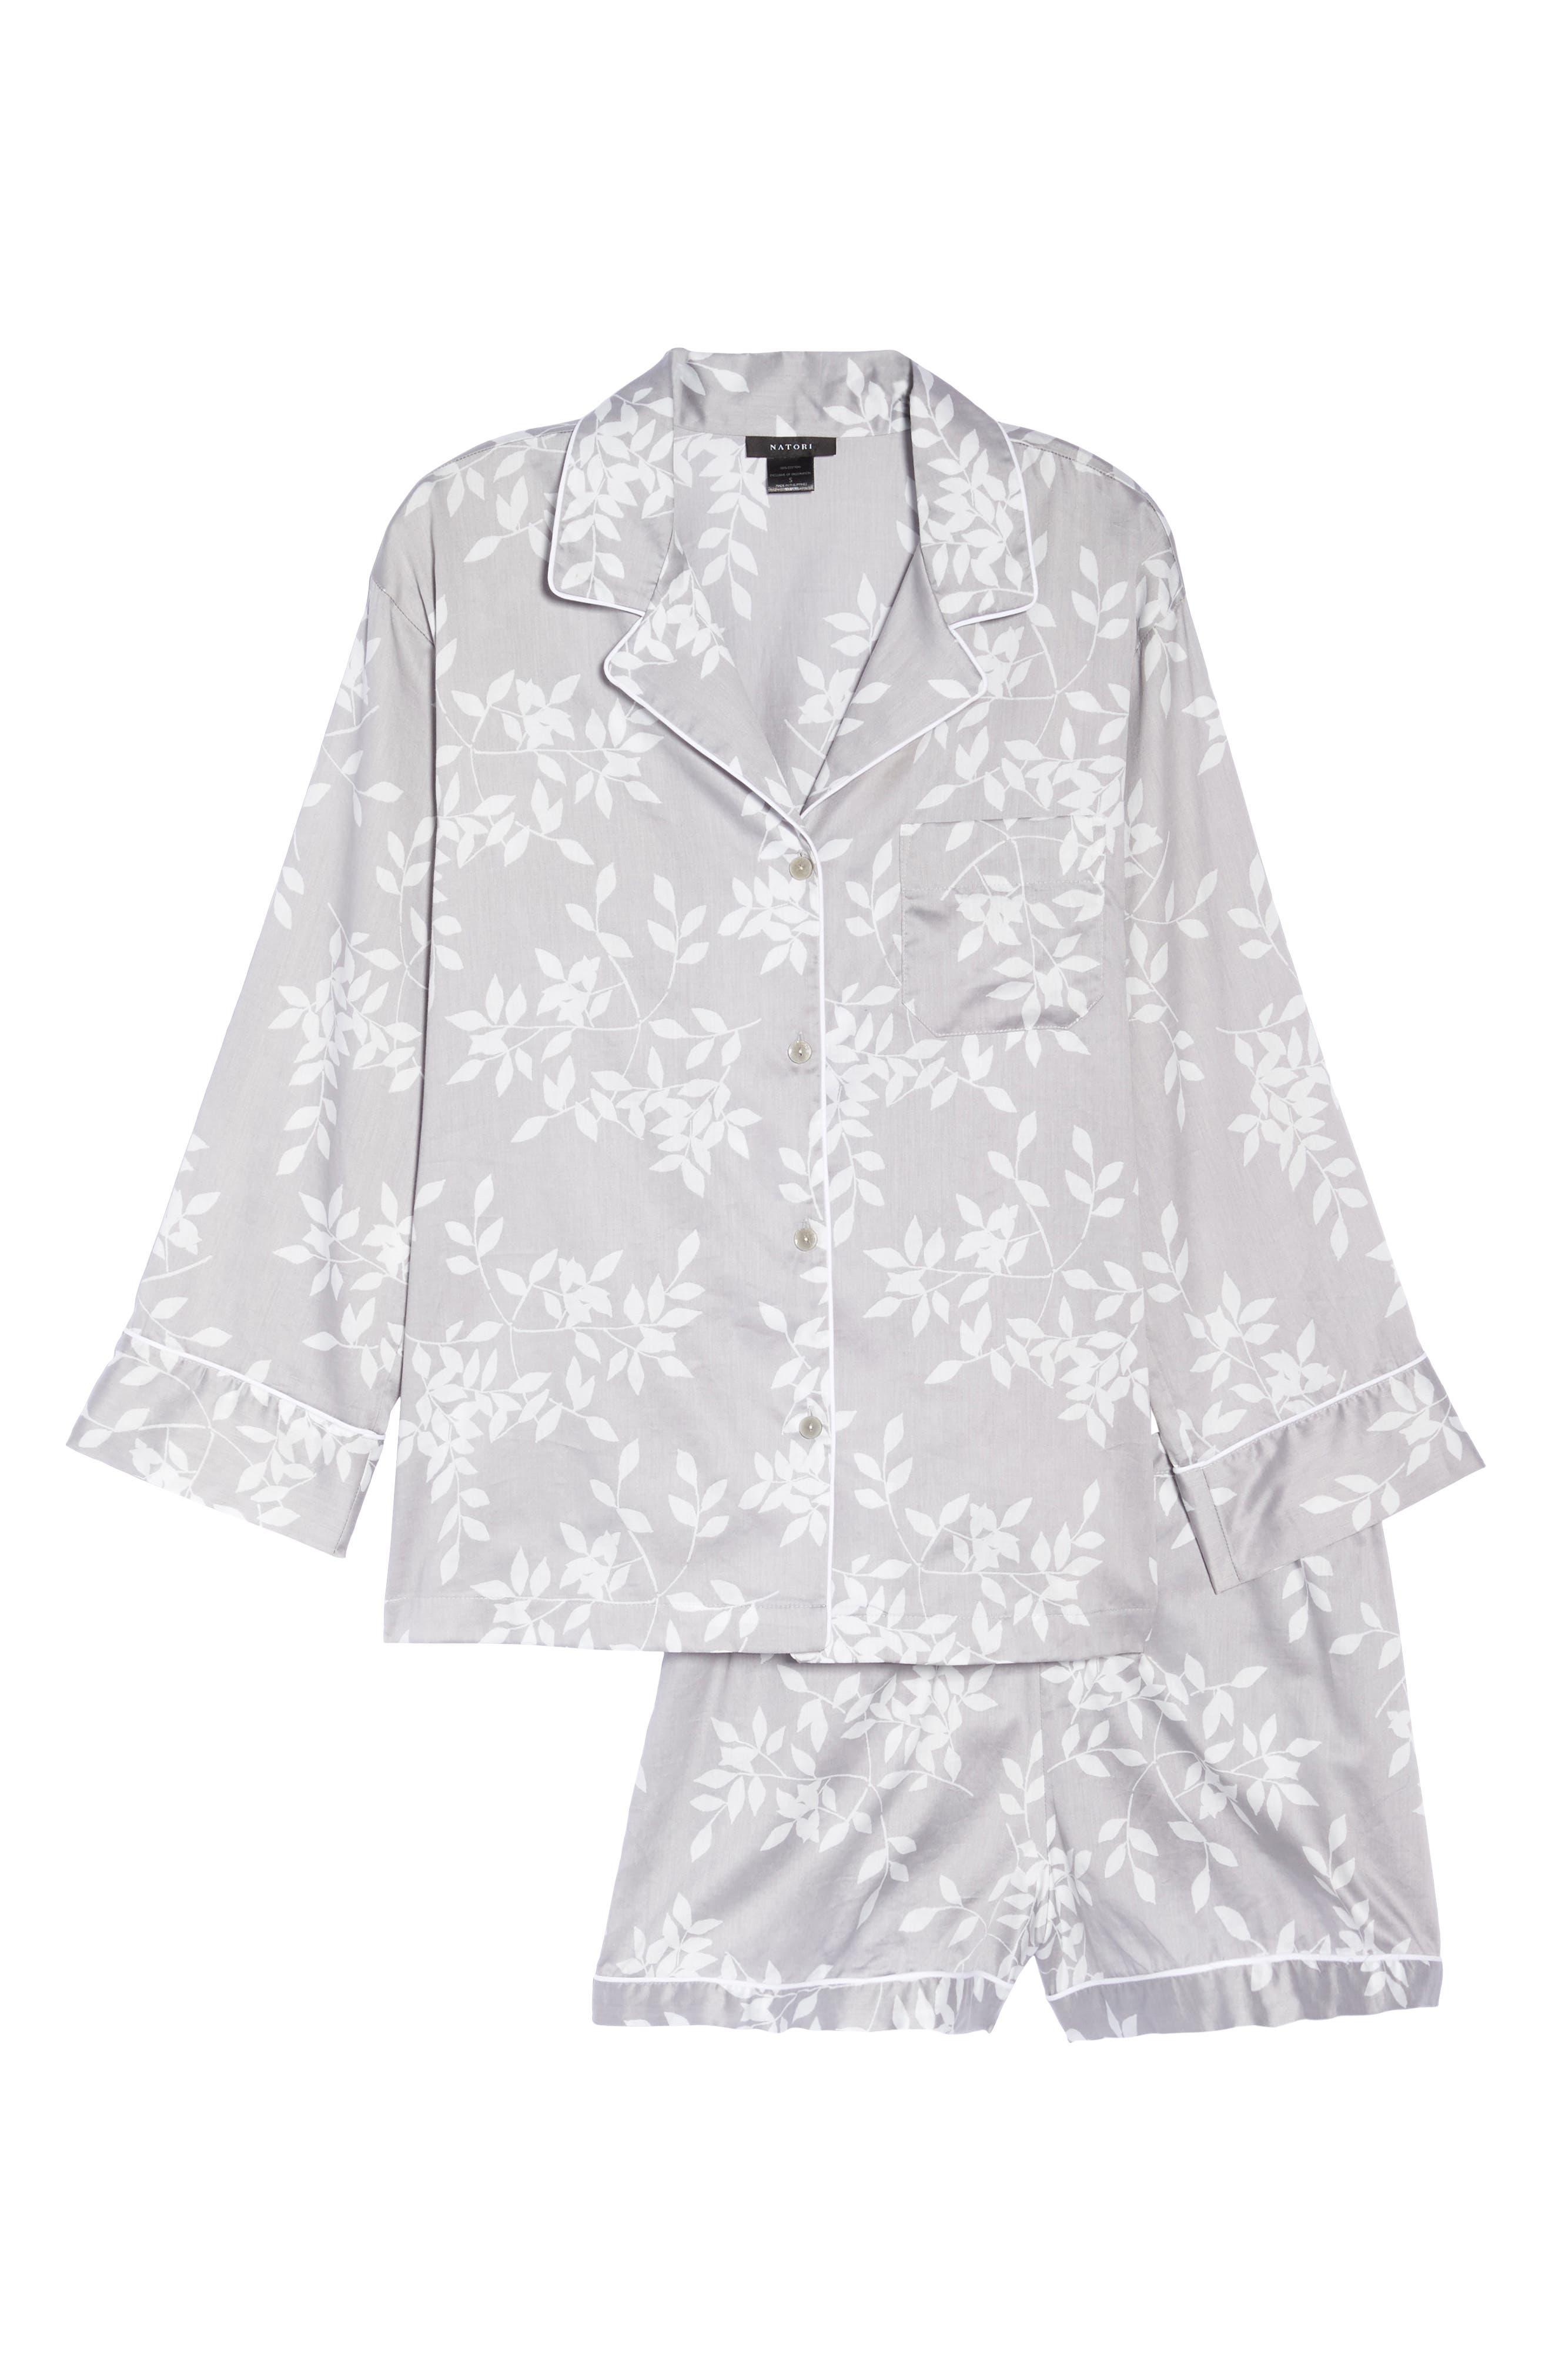 Branch Print Cotton Sateen Short Pajamas,                             Alternate thumbnail 6, color,                             021